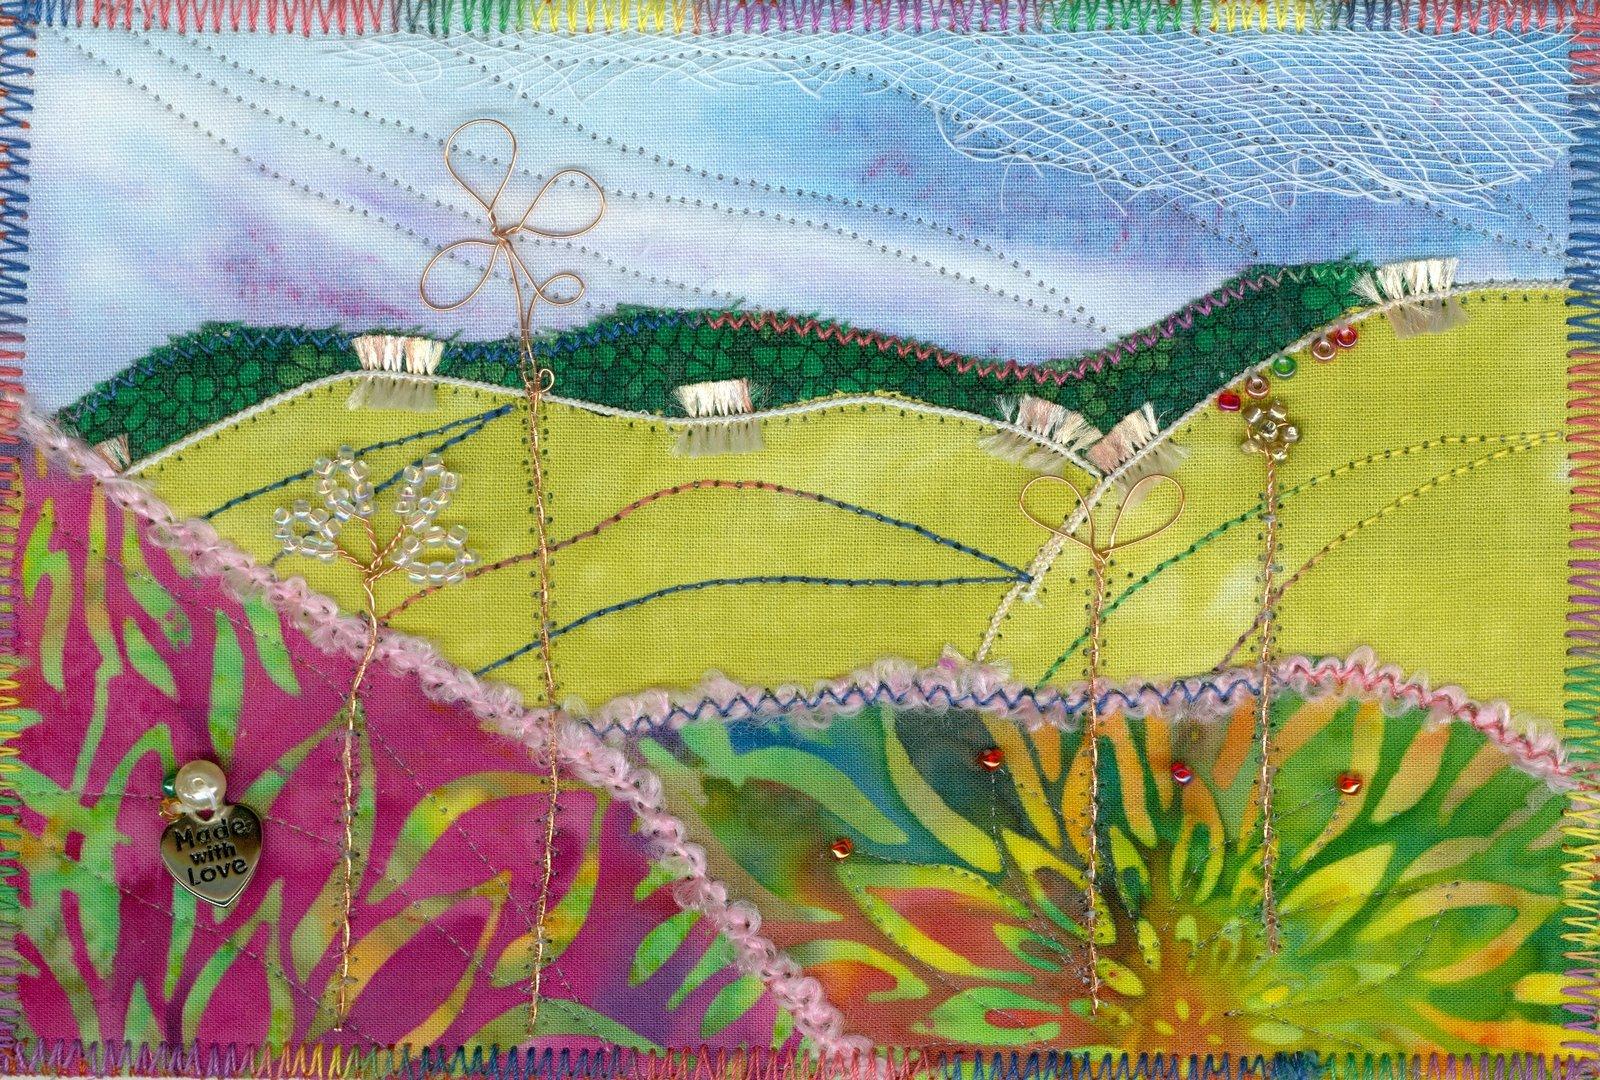 Vivian Helena Creates Fabric Landscapes